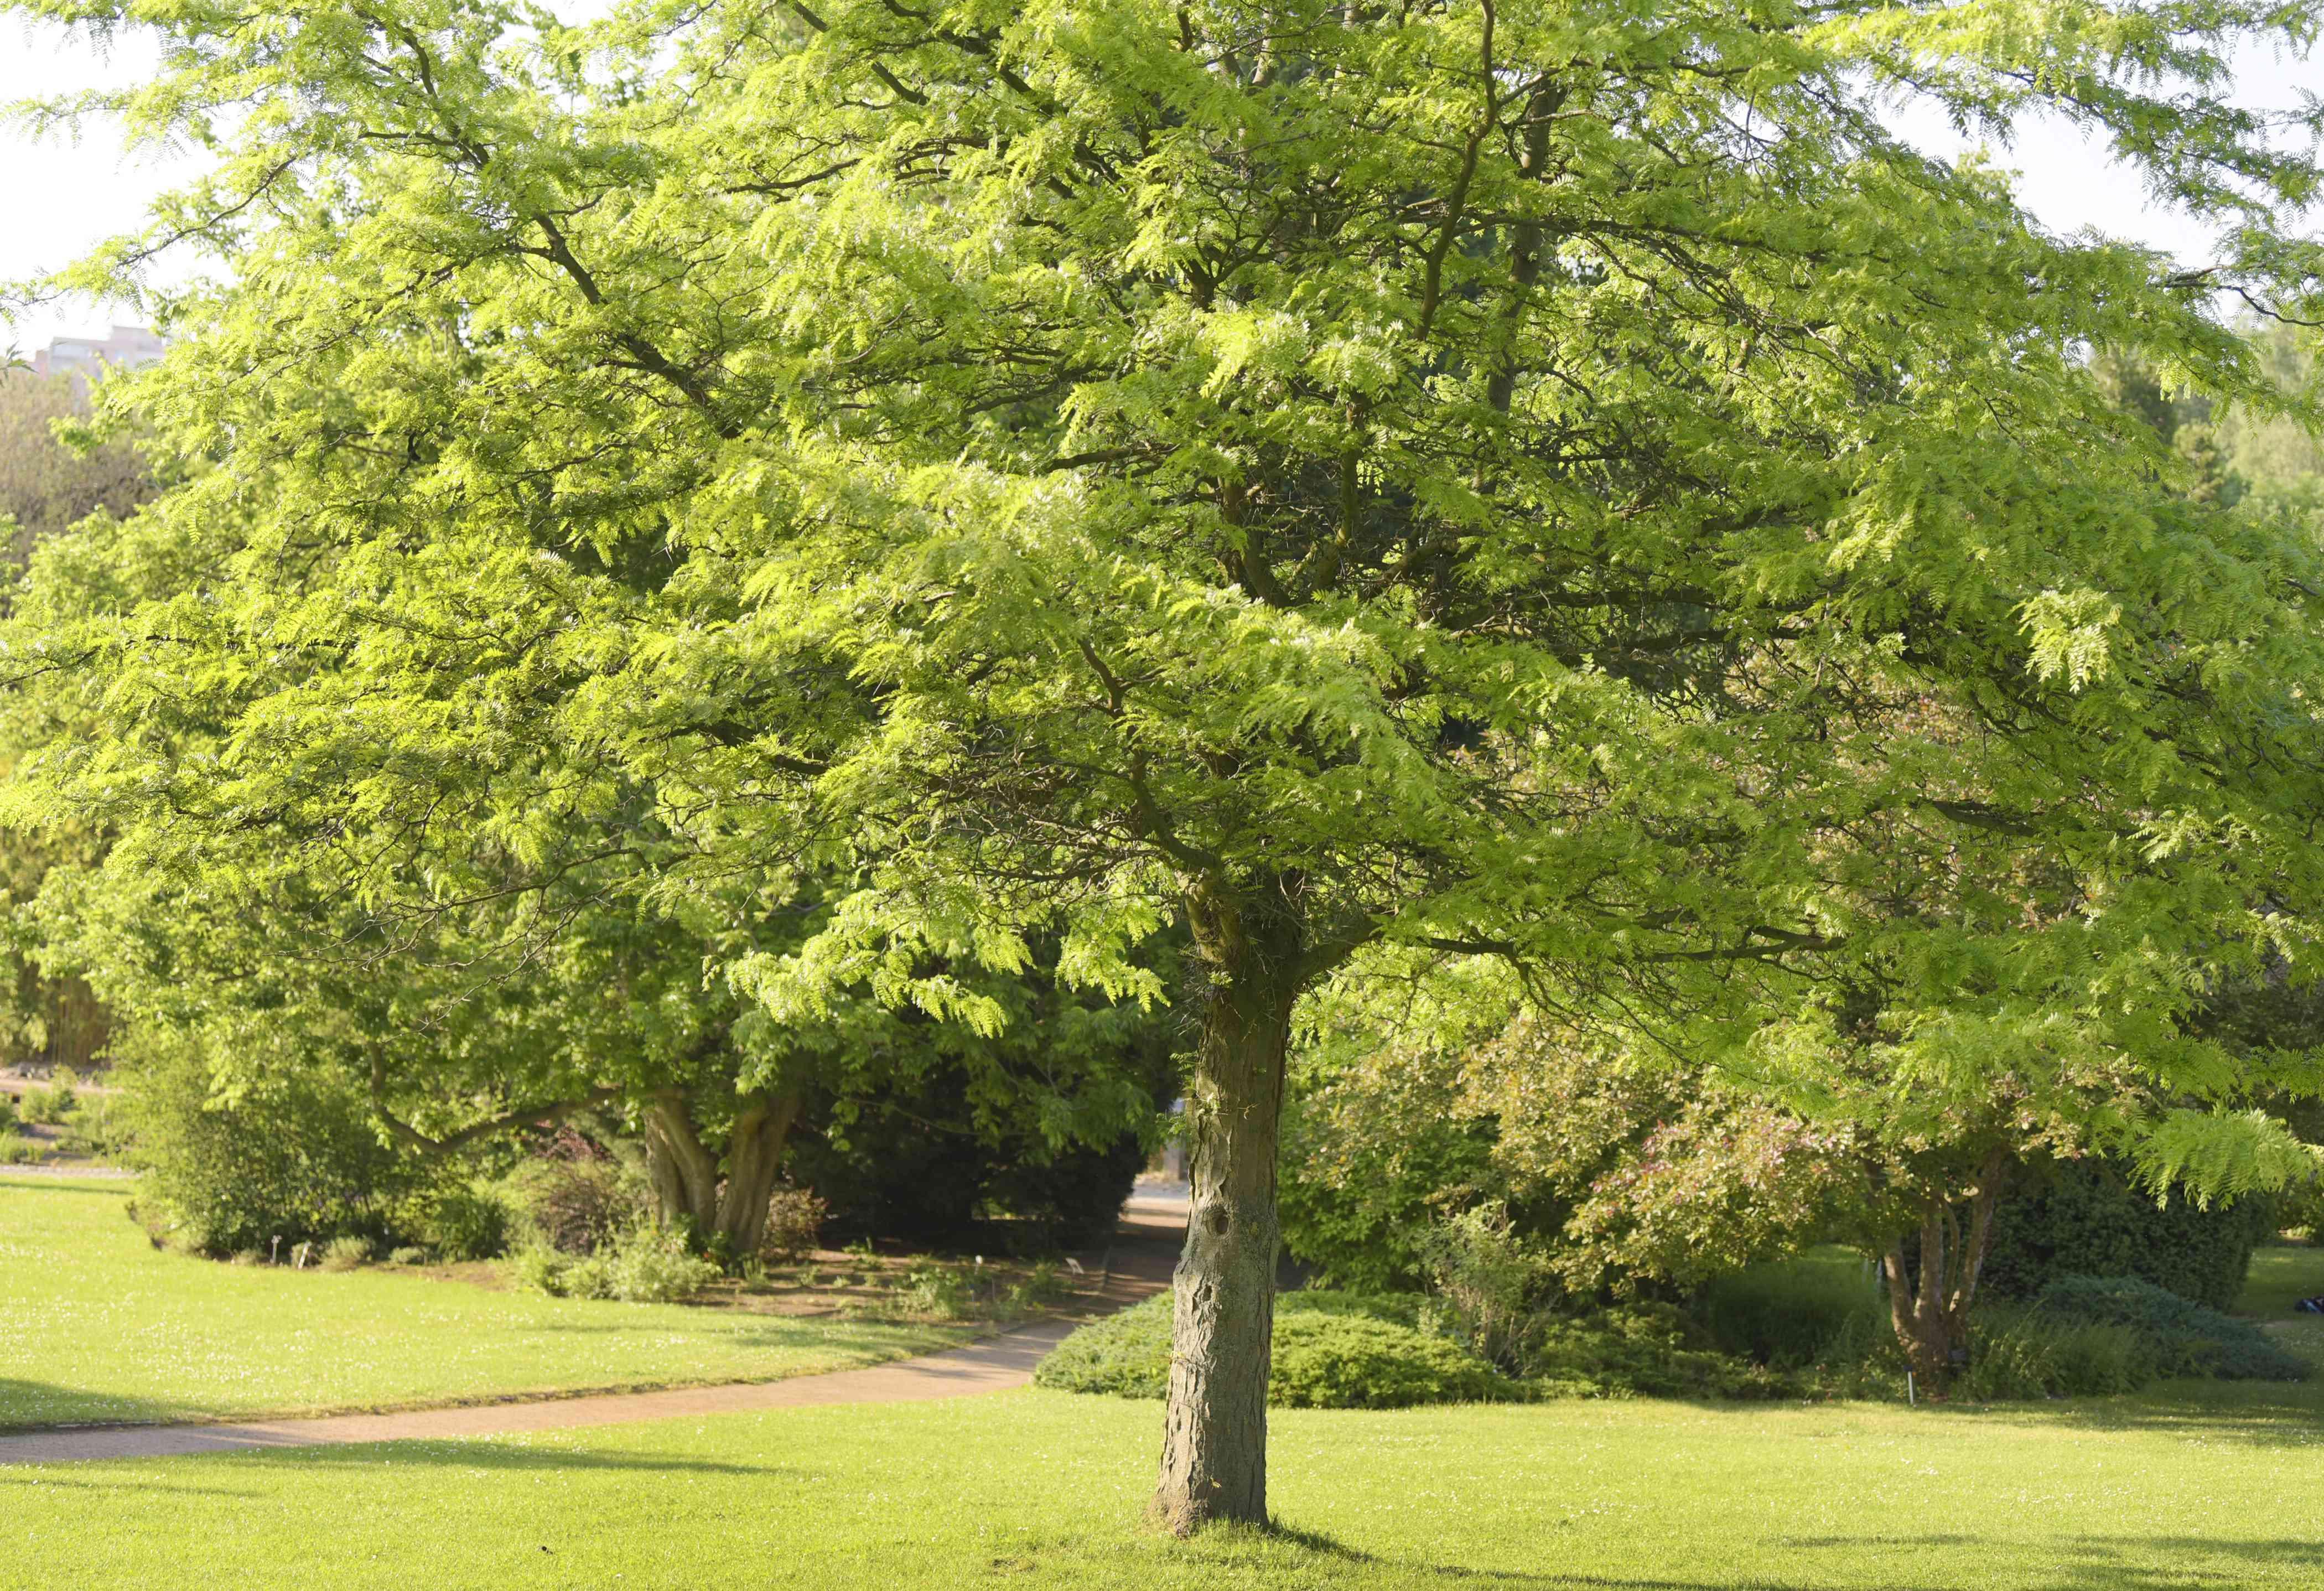 Sunburst honey locust tree with bright green leaves in garden field